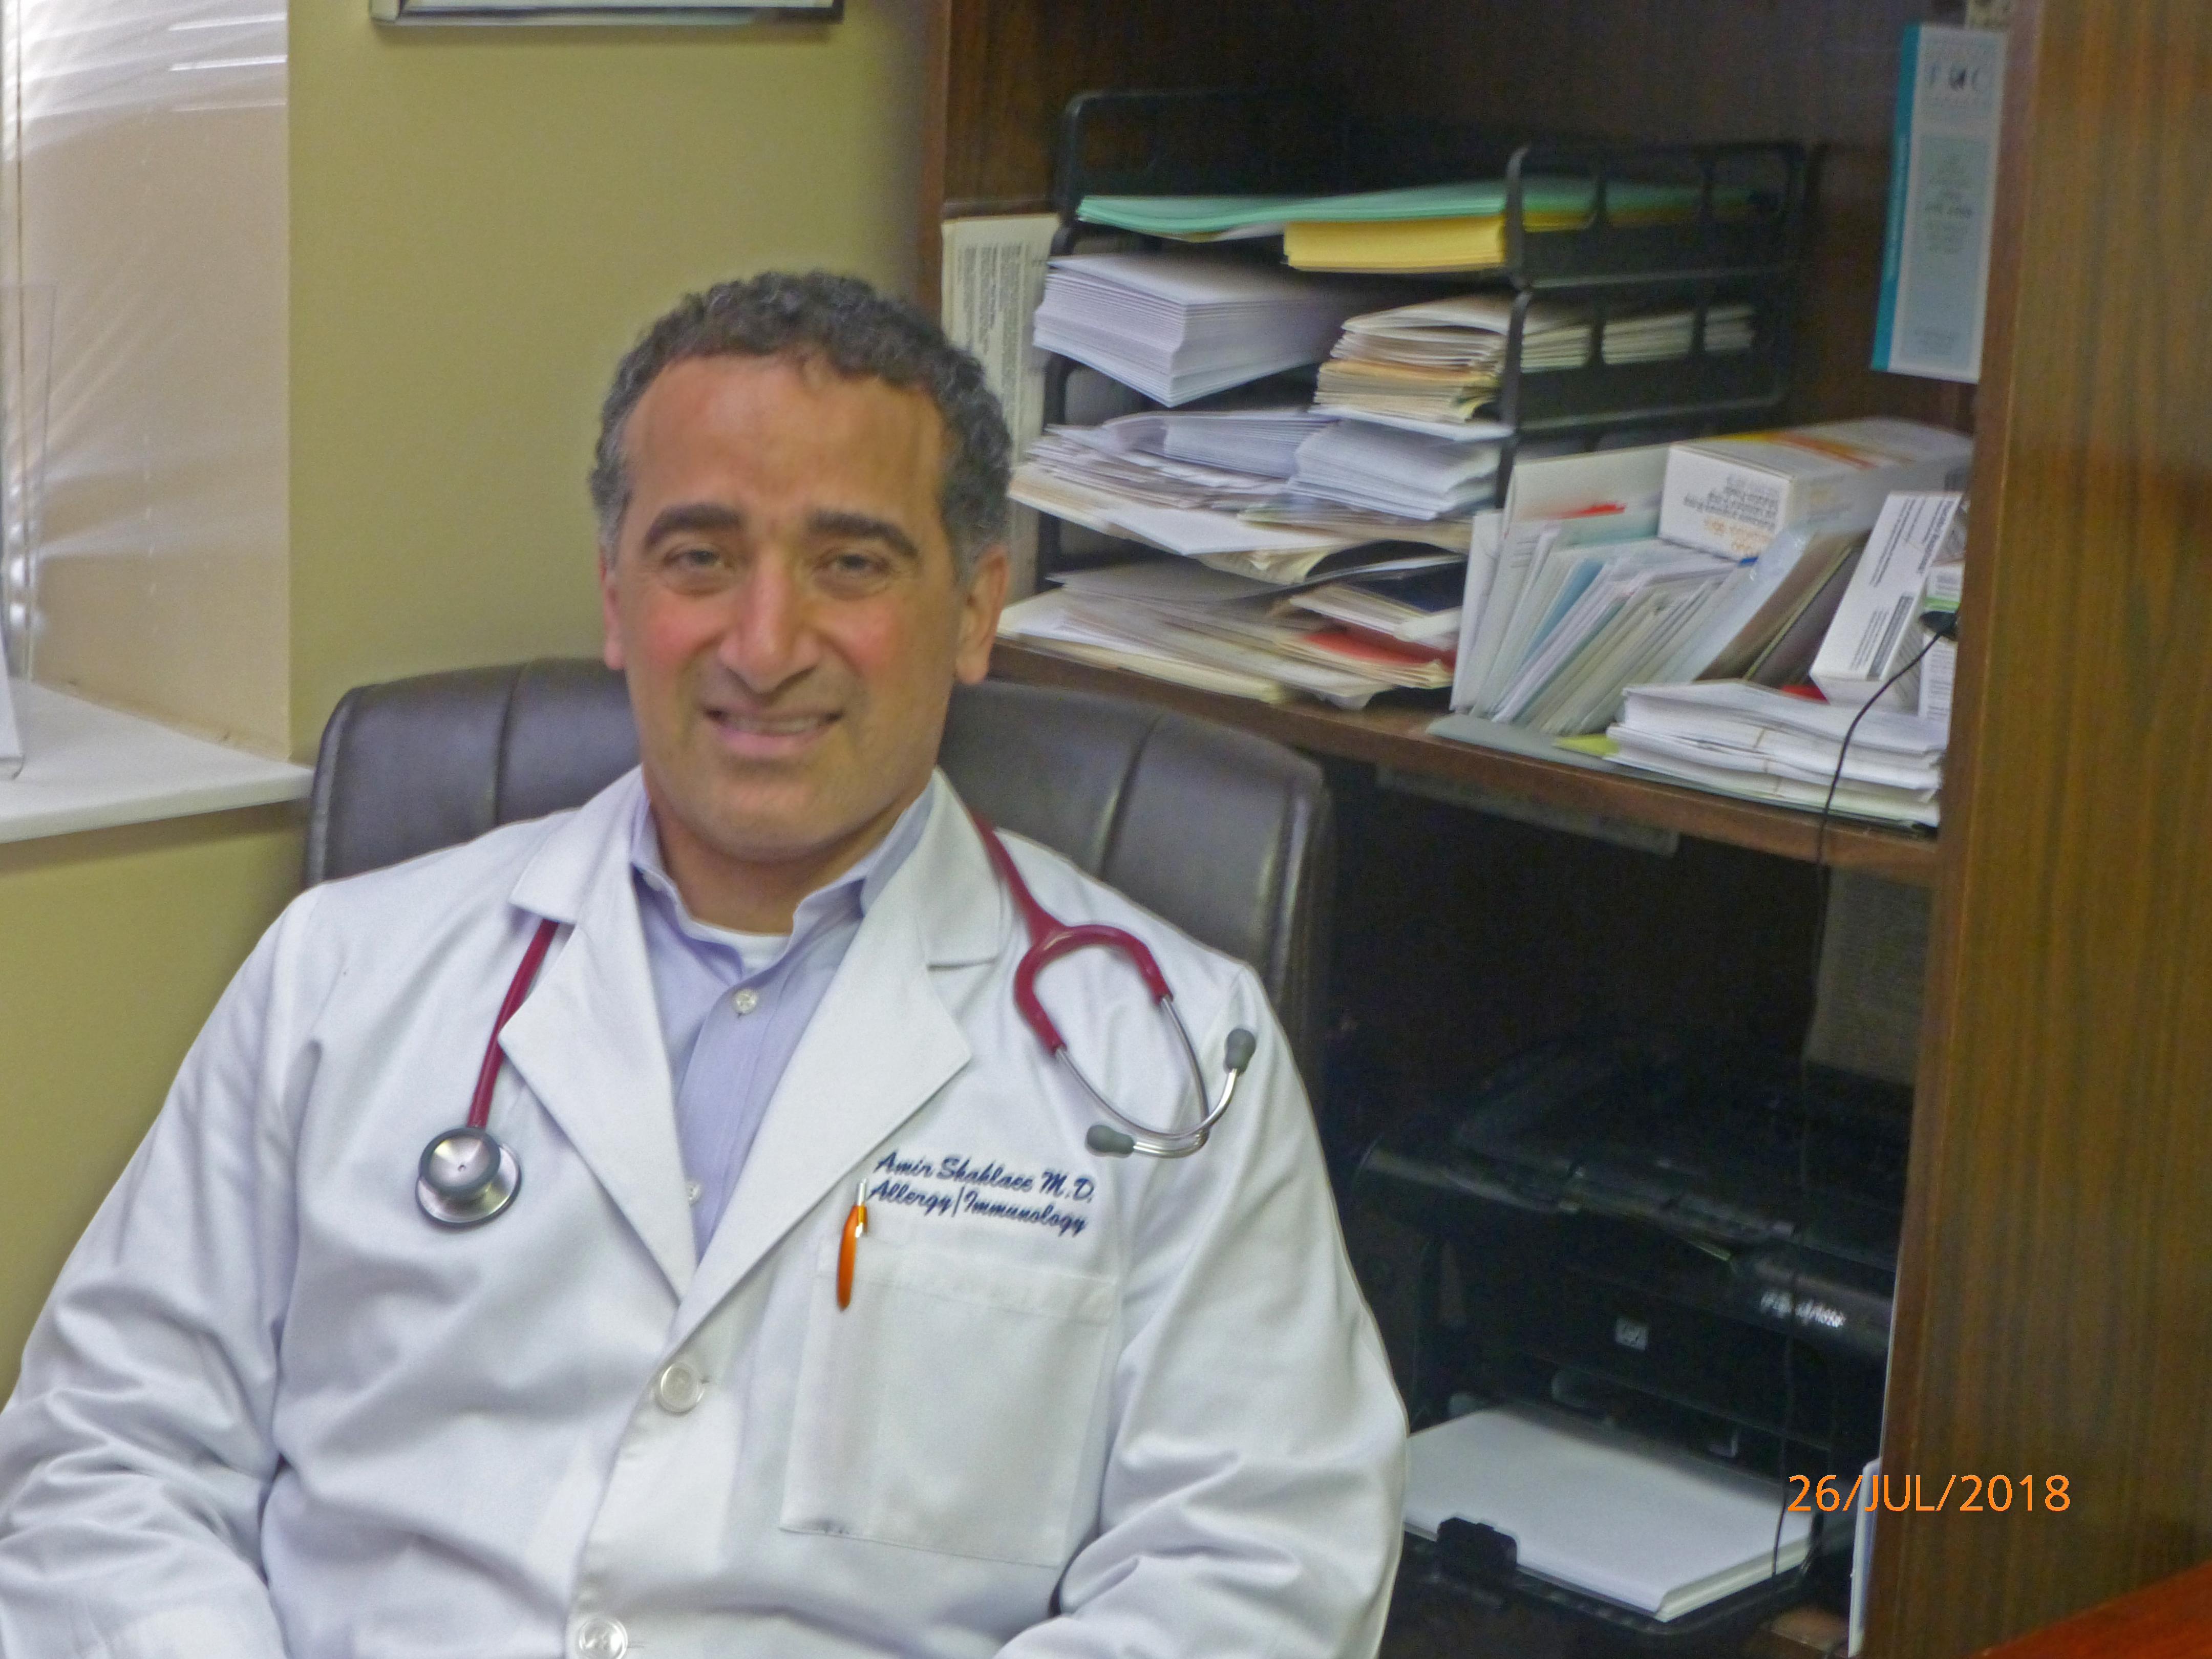 Dr. Shahlaee2